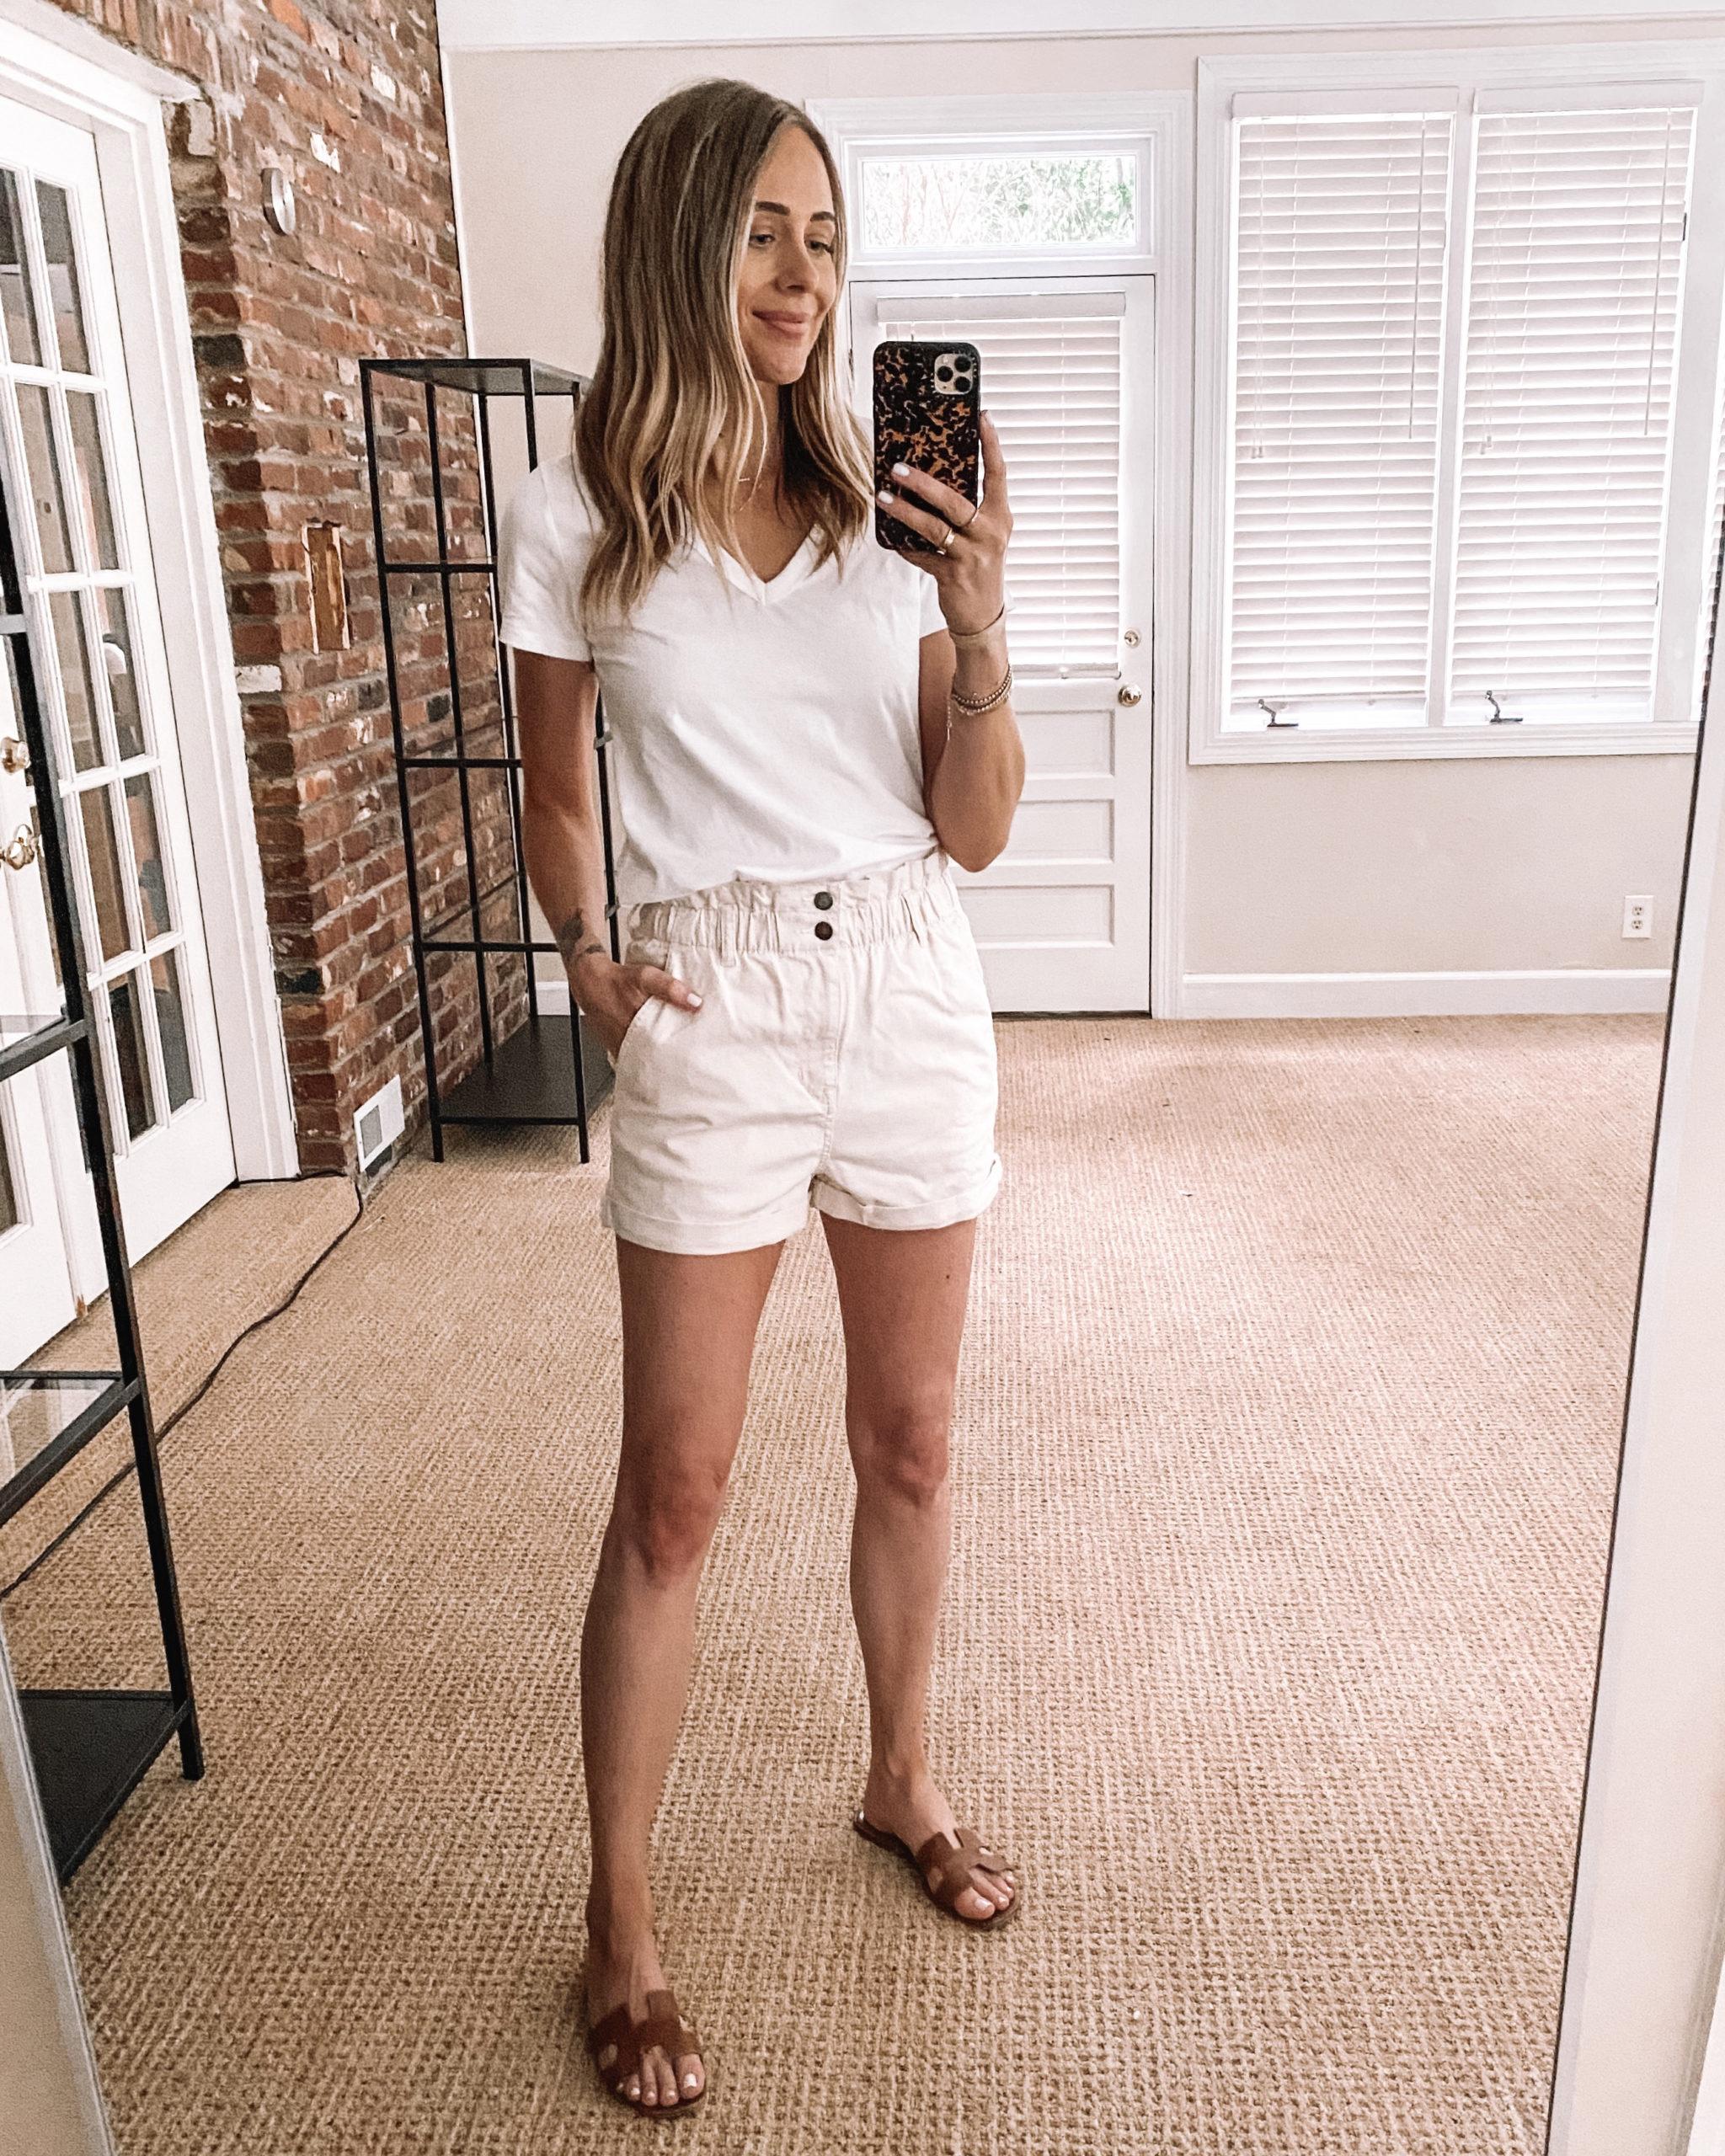 Fashion Jackson Target Finds White Vneck Tshirt White Twill Shorts